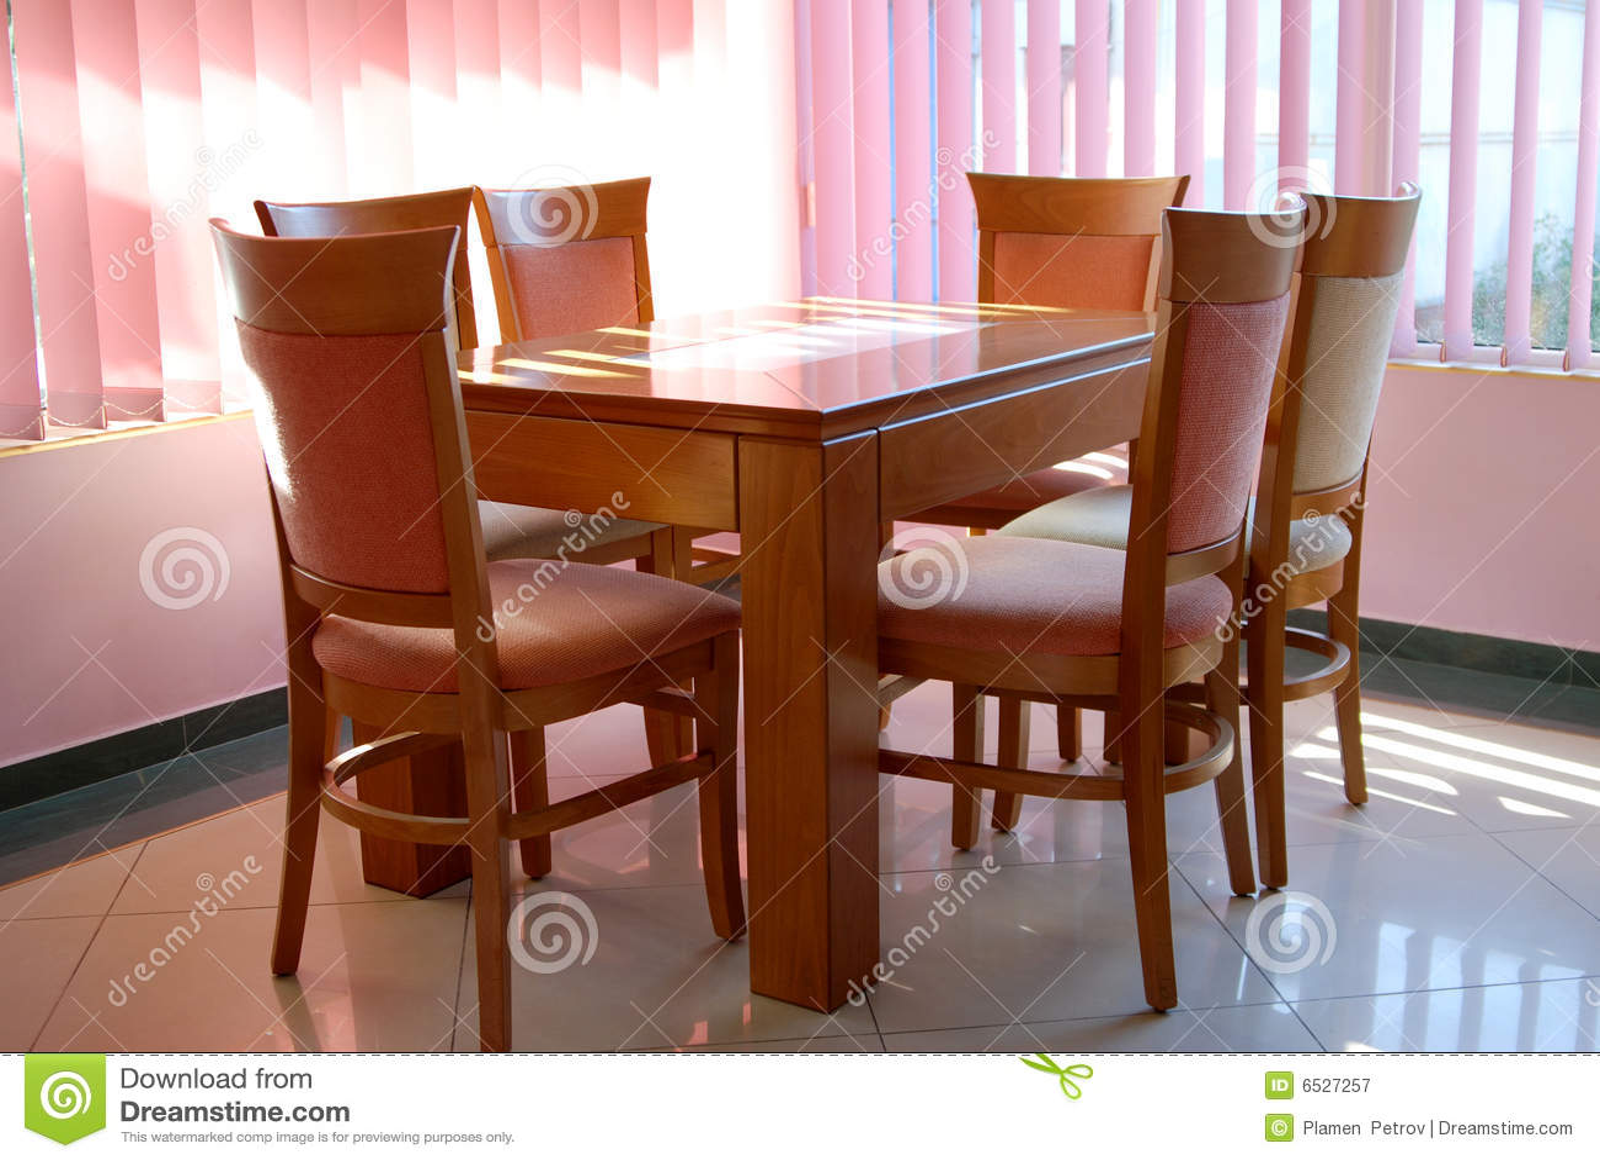 Luxury kitchen table royalty free stock photography for Luxury kitchen table